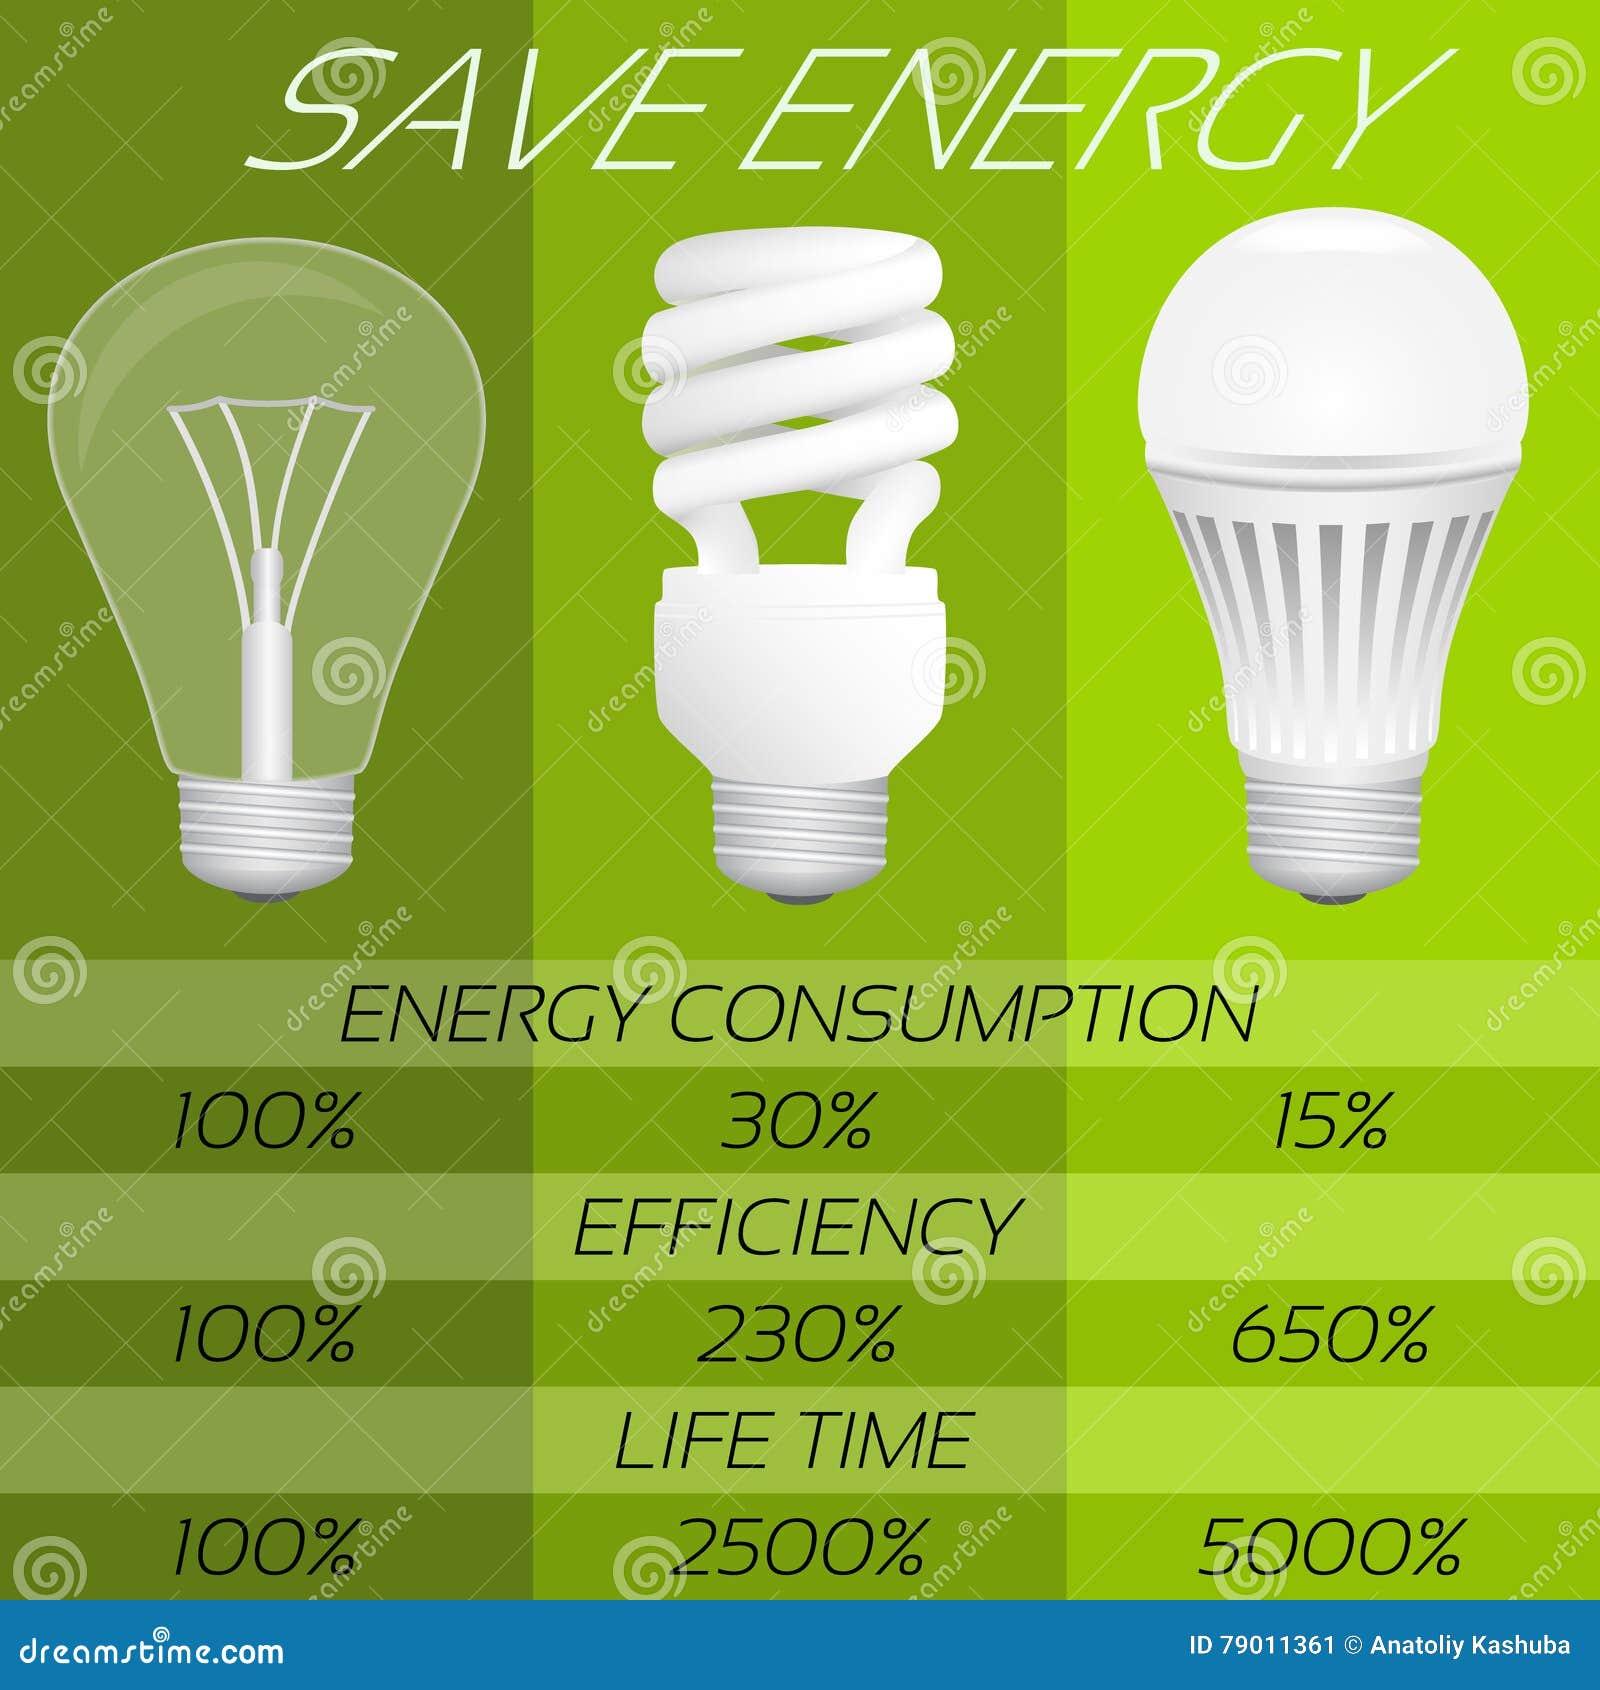 Fluorescent Light Vs Neon: Bulbs Cartoons, Illustrations & Vector Stock Images